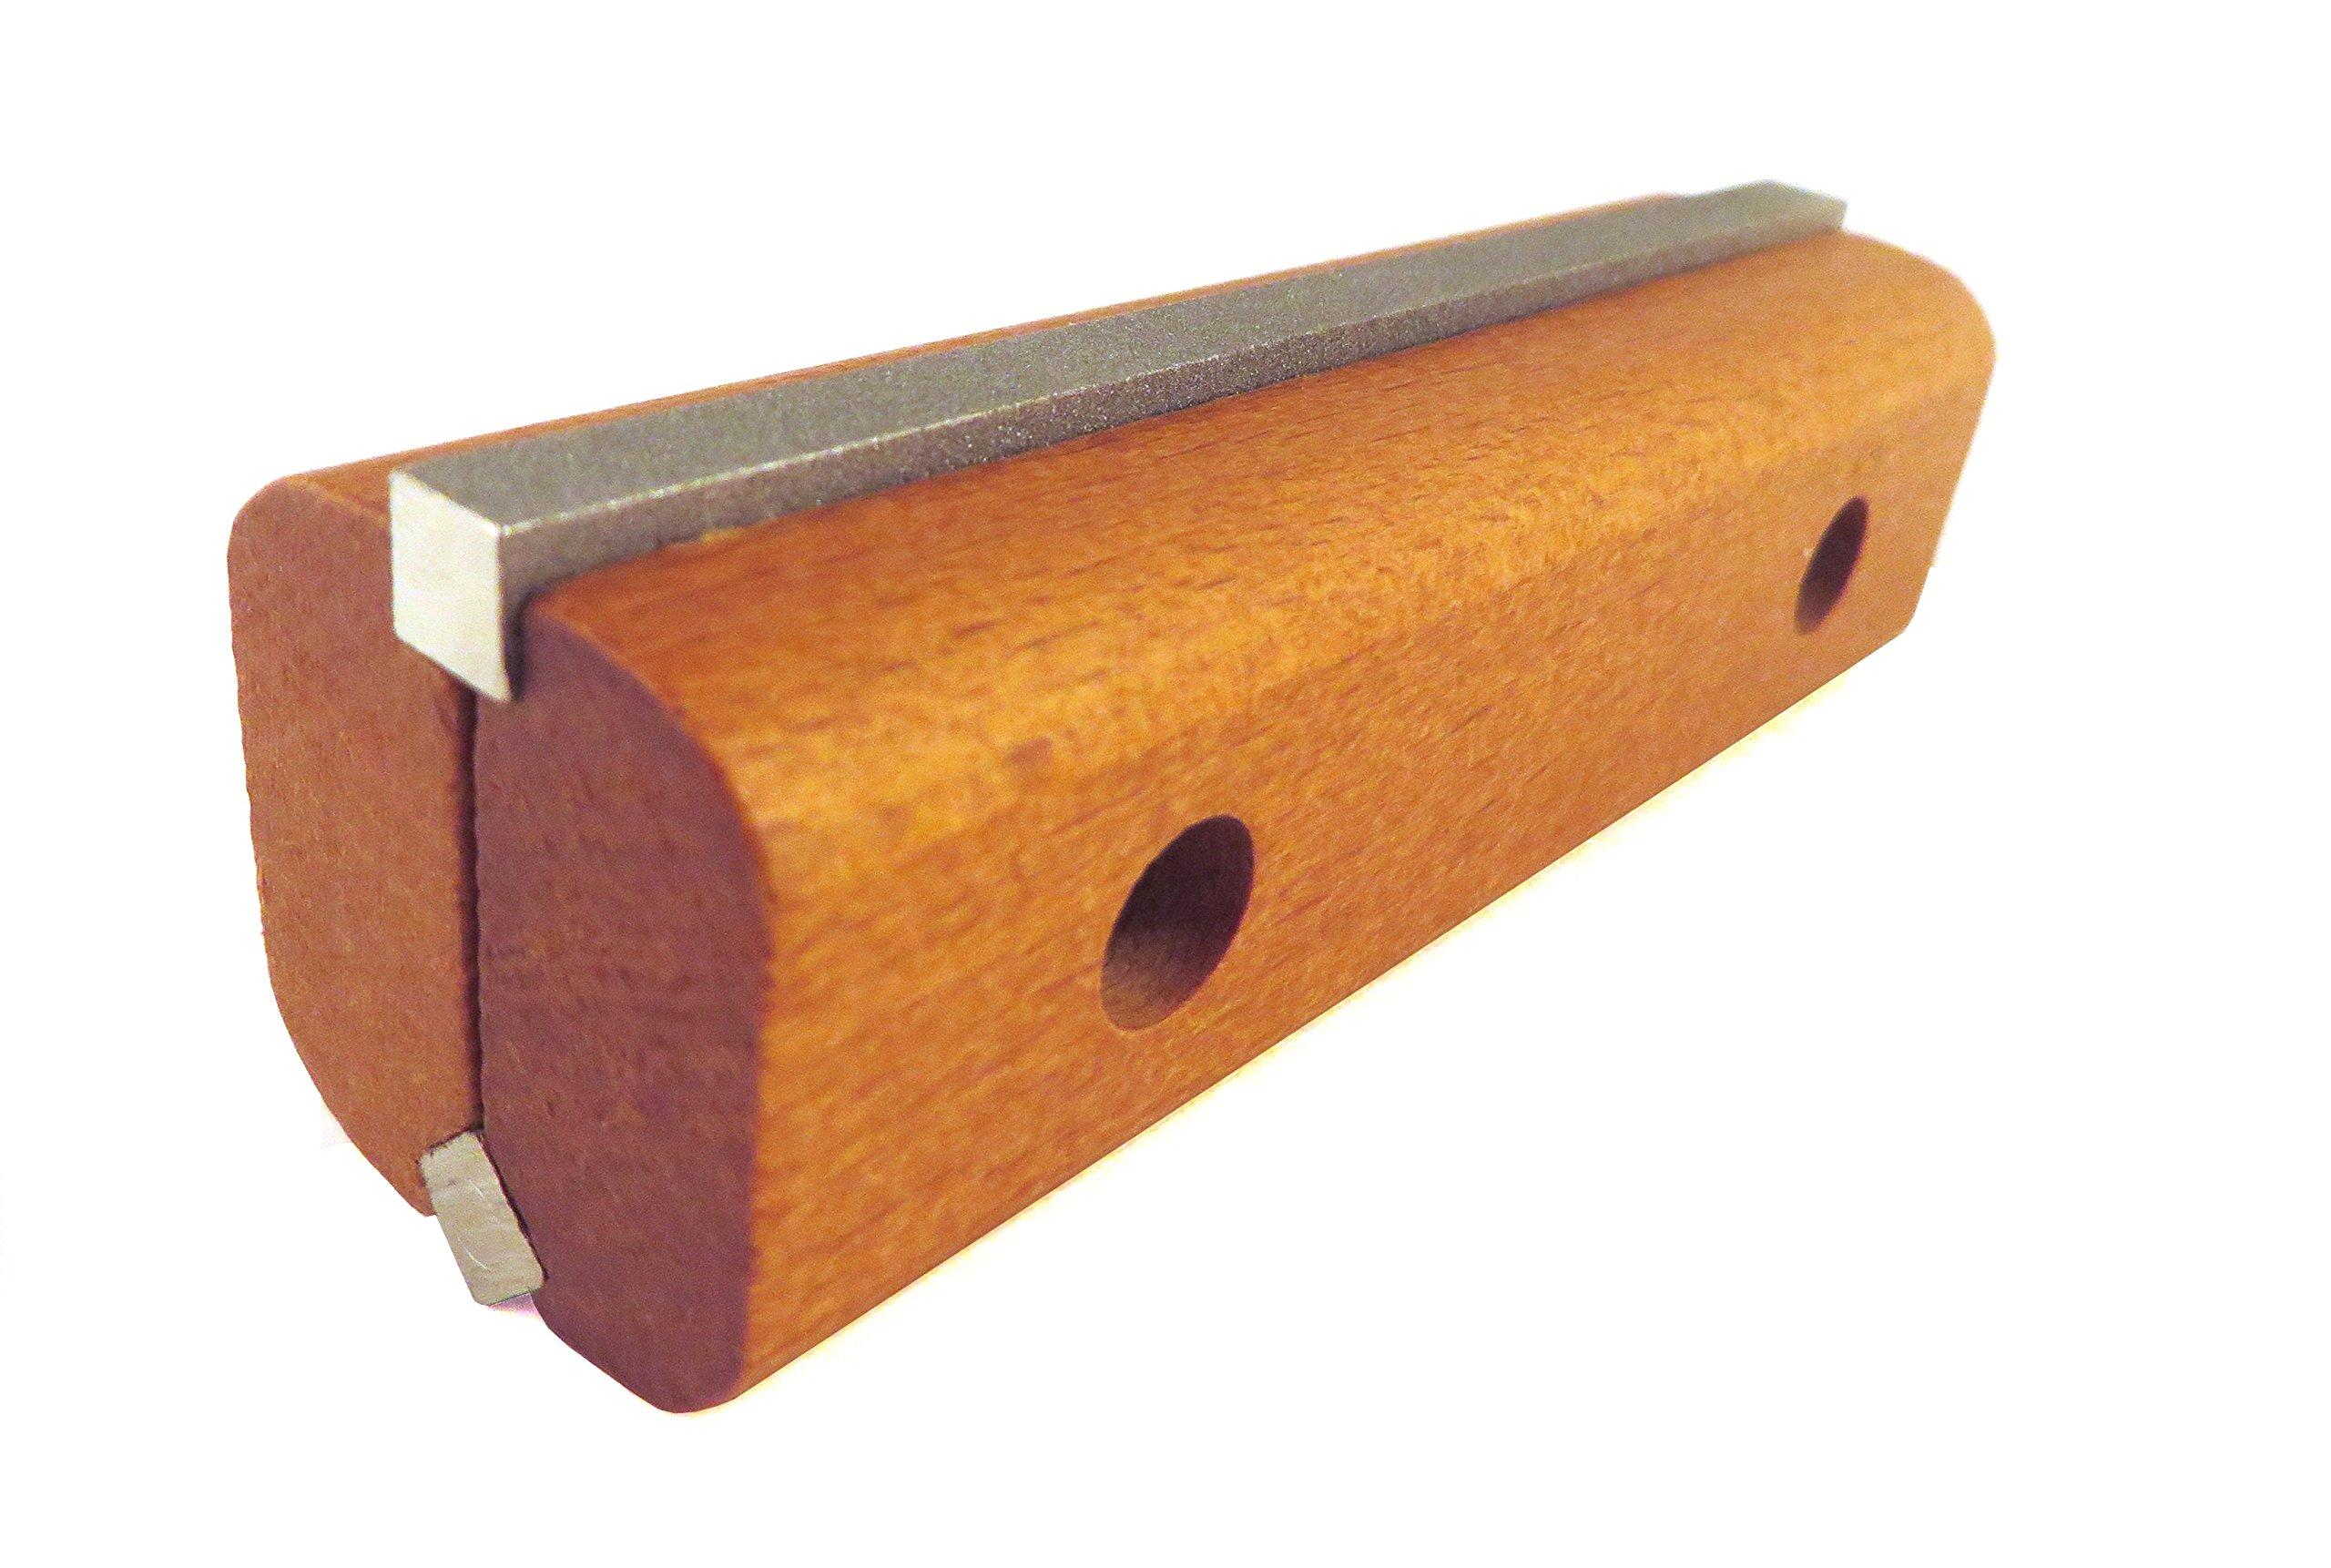 Jointer / Planer Blade Sharpener Diamond Knife Hone 300 and 600 grit in Wood Holder with Reversible Sharpening Stones KH-10D